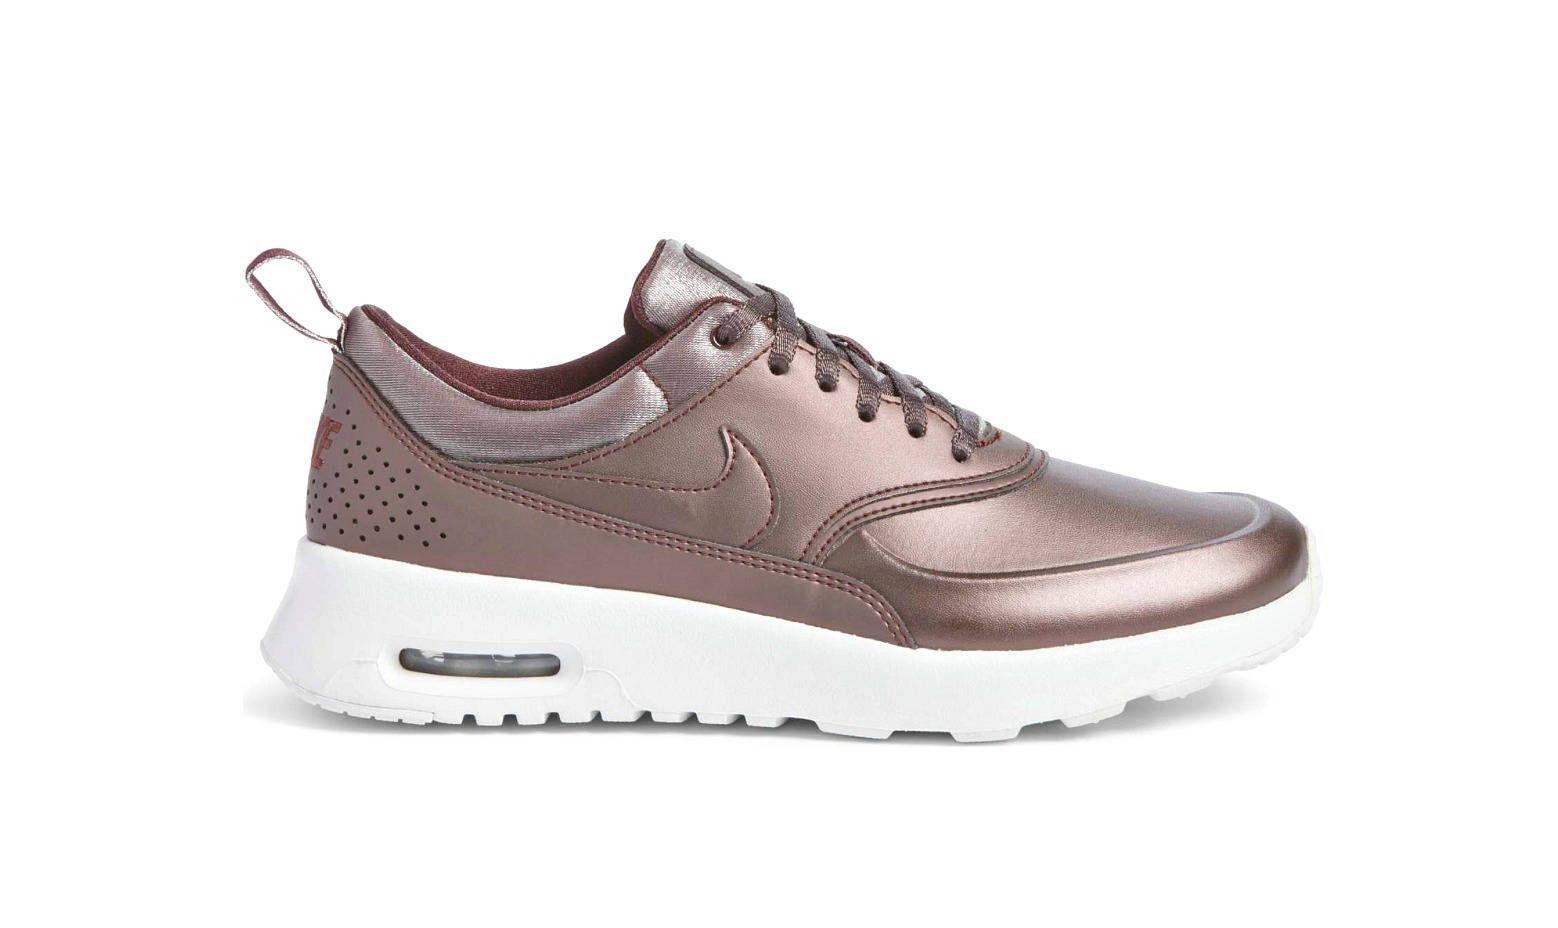 Swarovski Nike - Air Max Thea - Bling Nike shoes - Rose Gold Shoes-Nike  Swarovski- Nike Shoes - Bling shoes - Bling nikes-Rose Gold Sneakers by ... 6b9204370